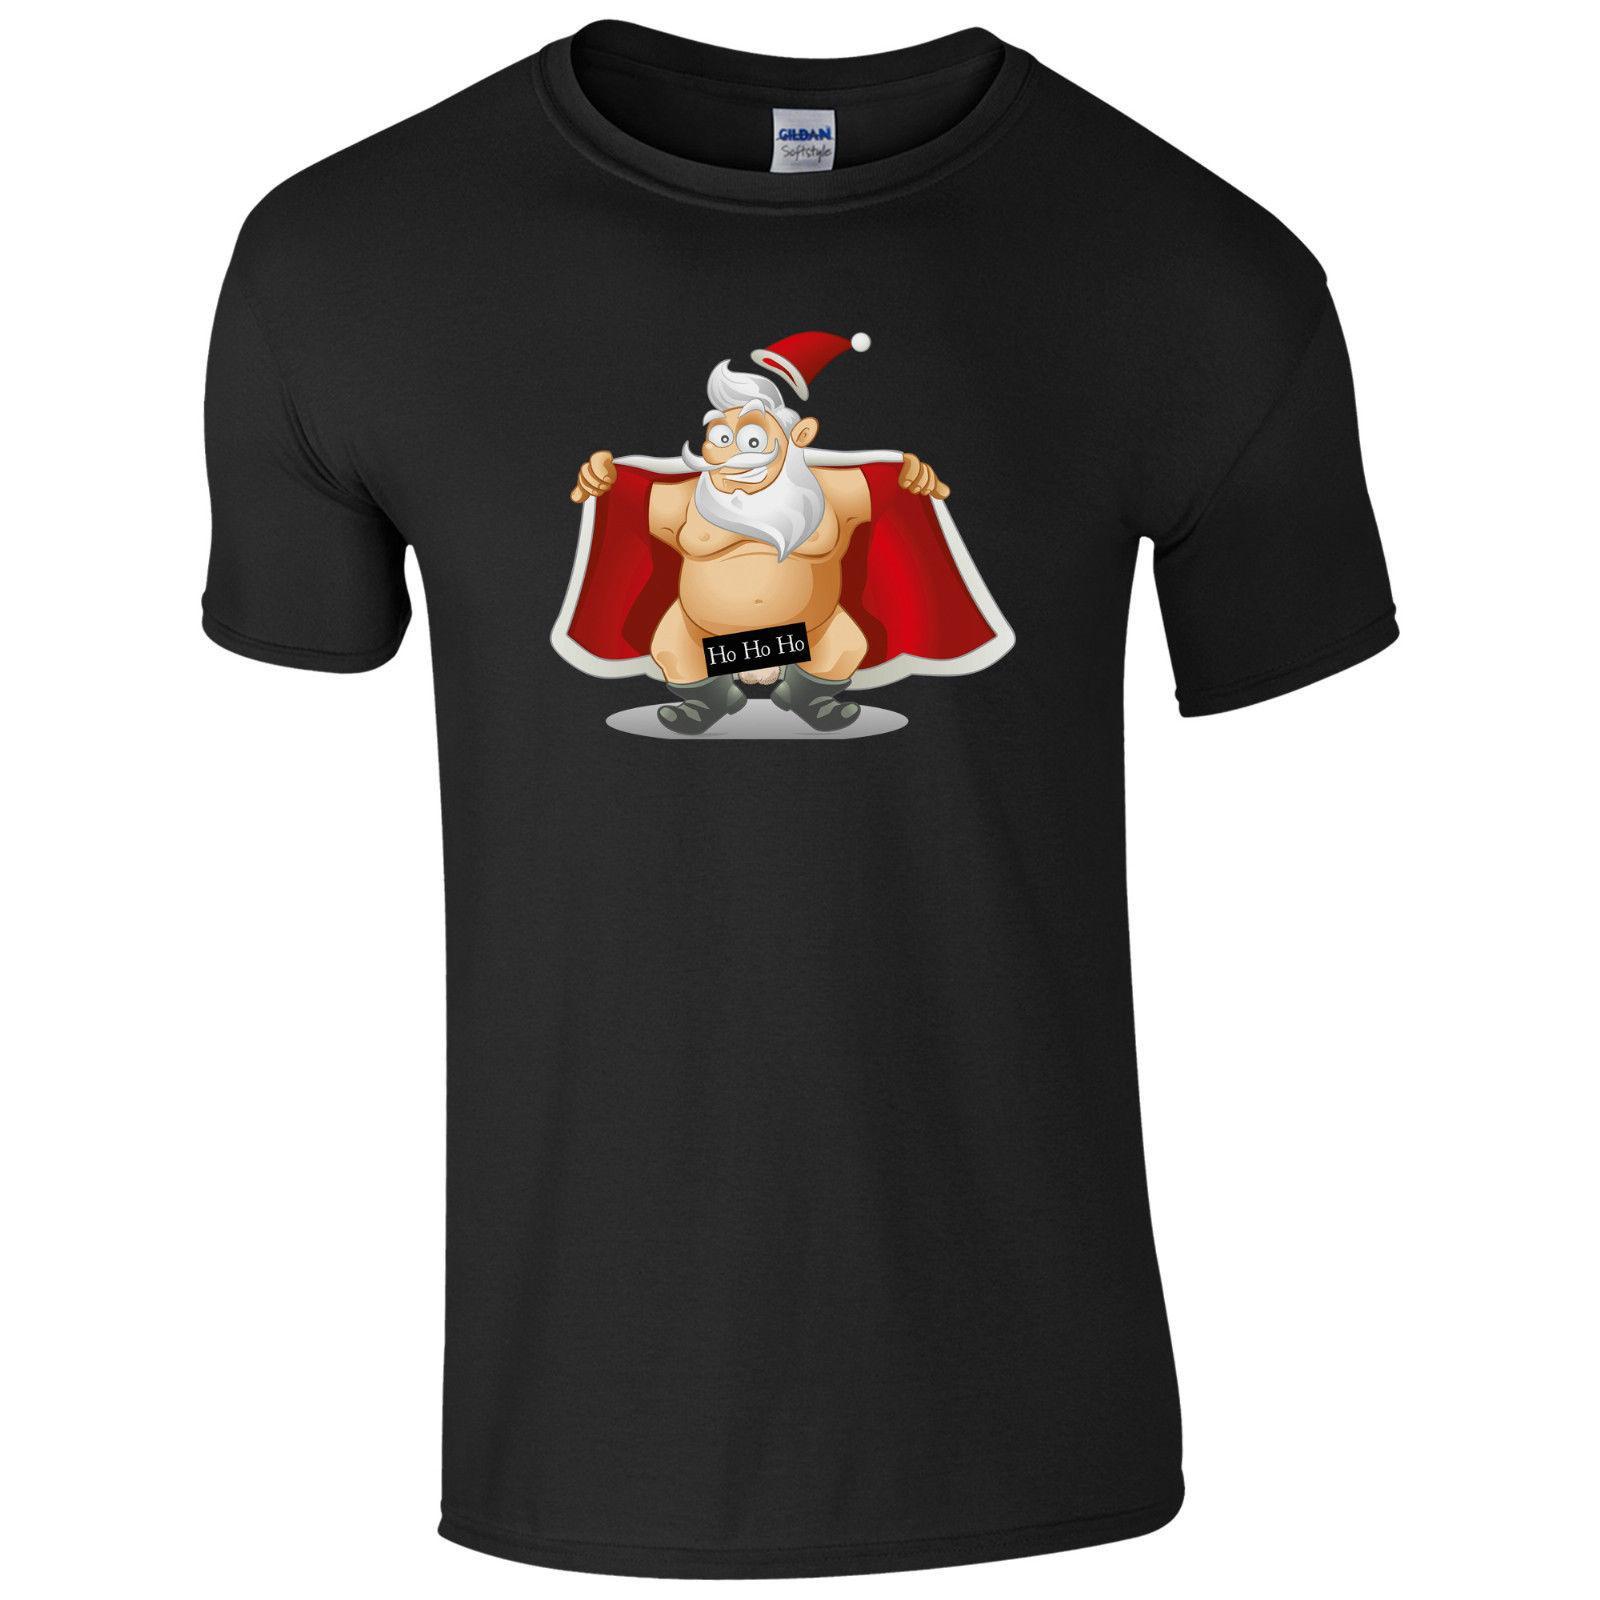 886e688f Naughty Santa Flashing Ho Ho Ho T Shirt Funny Rude Christmas Gift Joke Men  Top T Shirt Designs Cool Shirts From Mochostore, $24.2  DHgate.Com